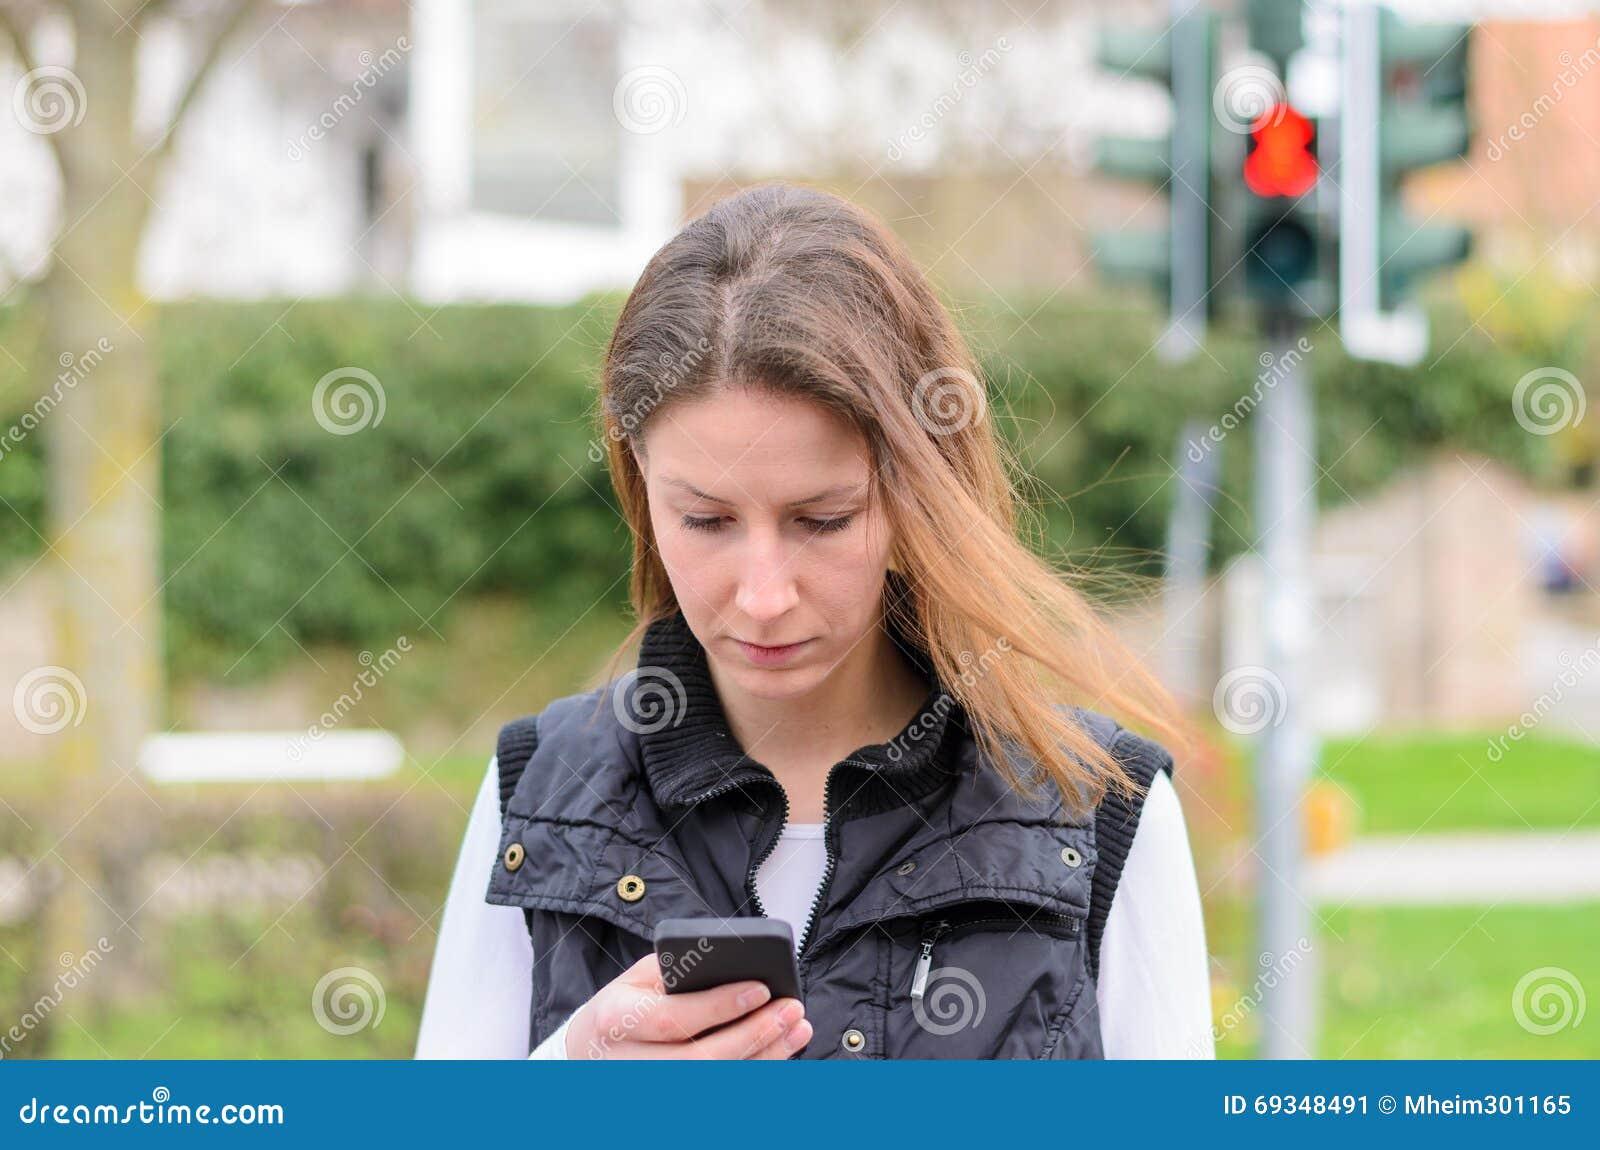 telephone portable femme celibataire)